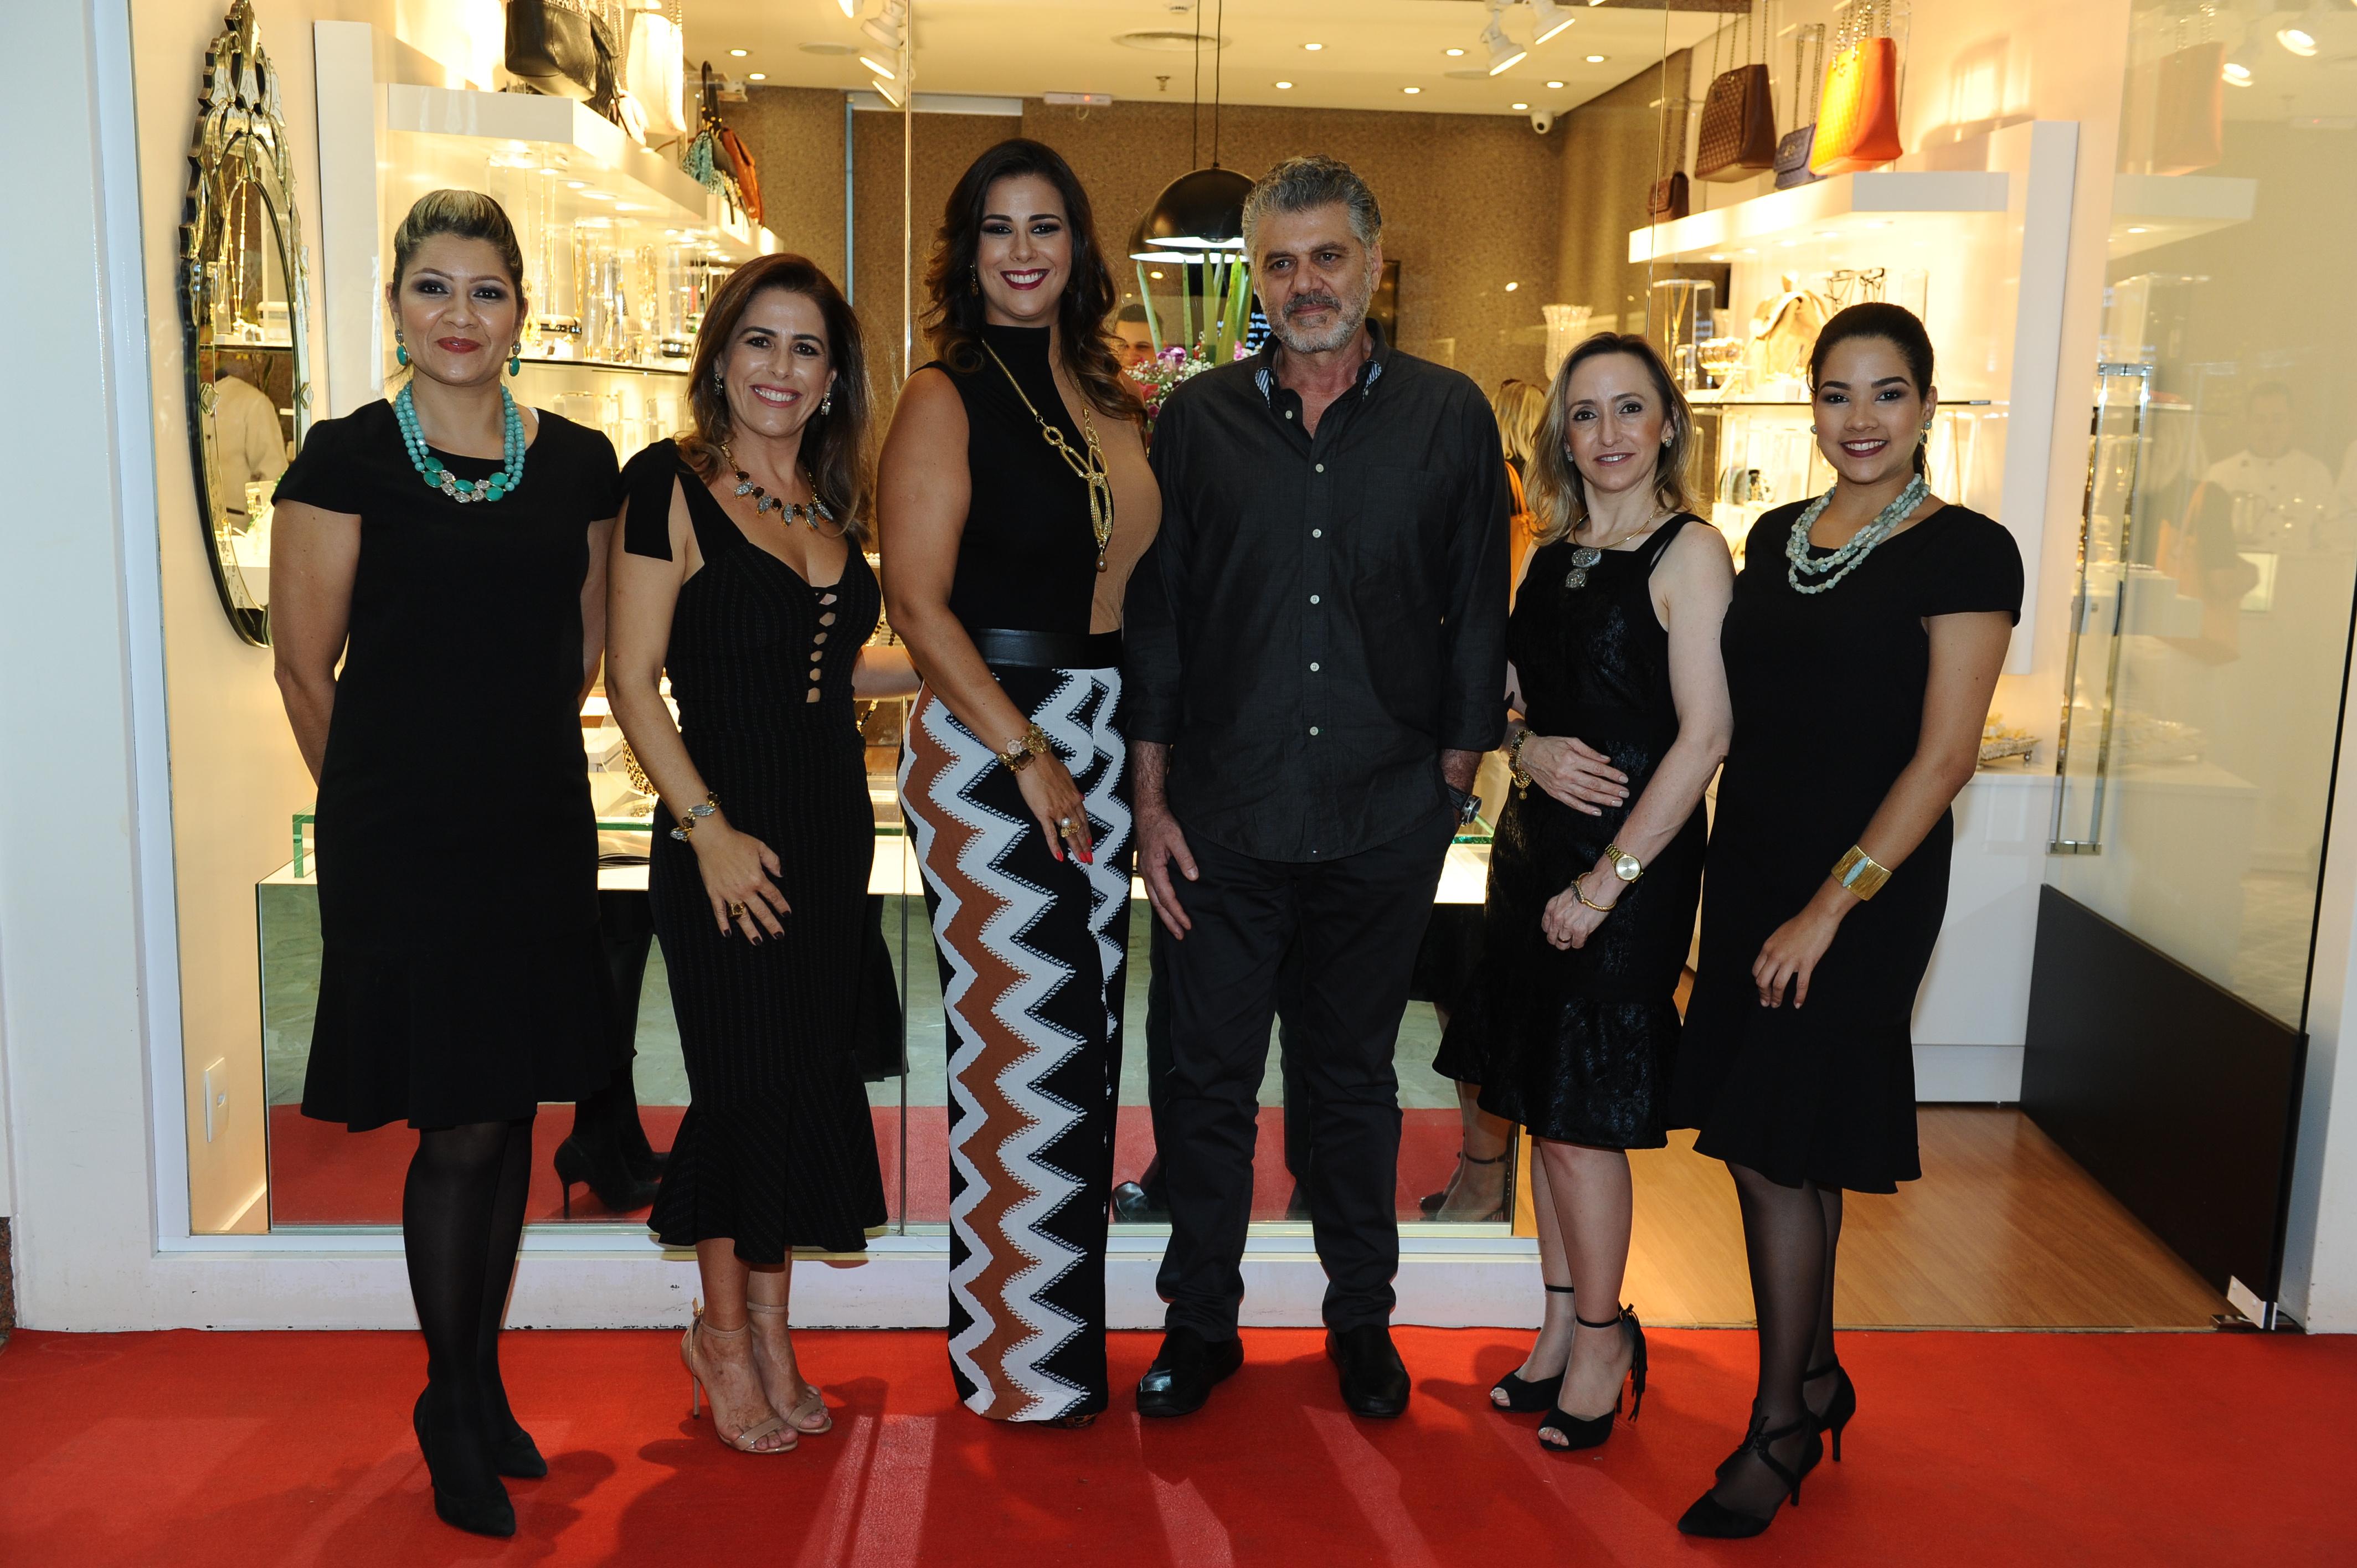 Mara Fernandes, Vanessa Auto, Bianca Raffi, Fabrizio Giannone, Catiane Carassa e Lyandra Dias